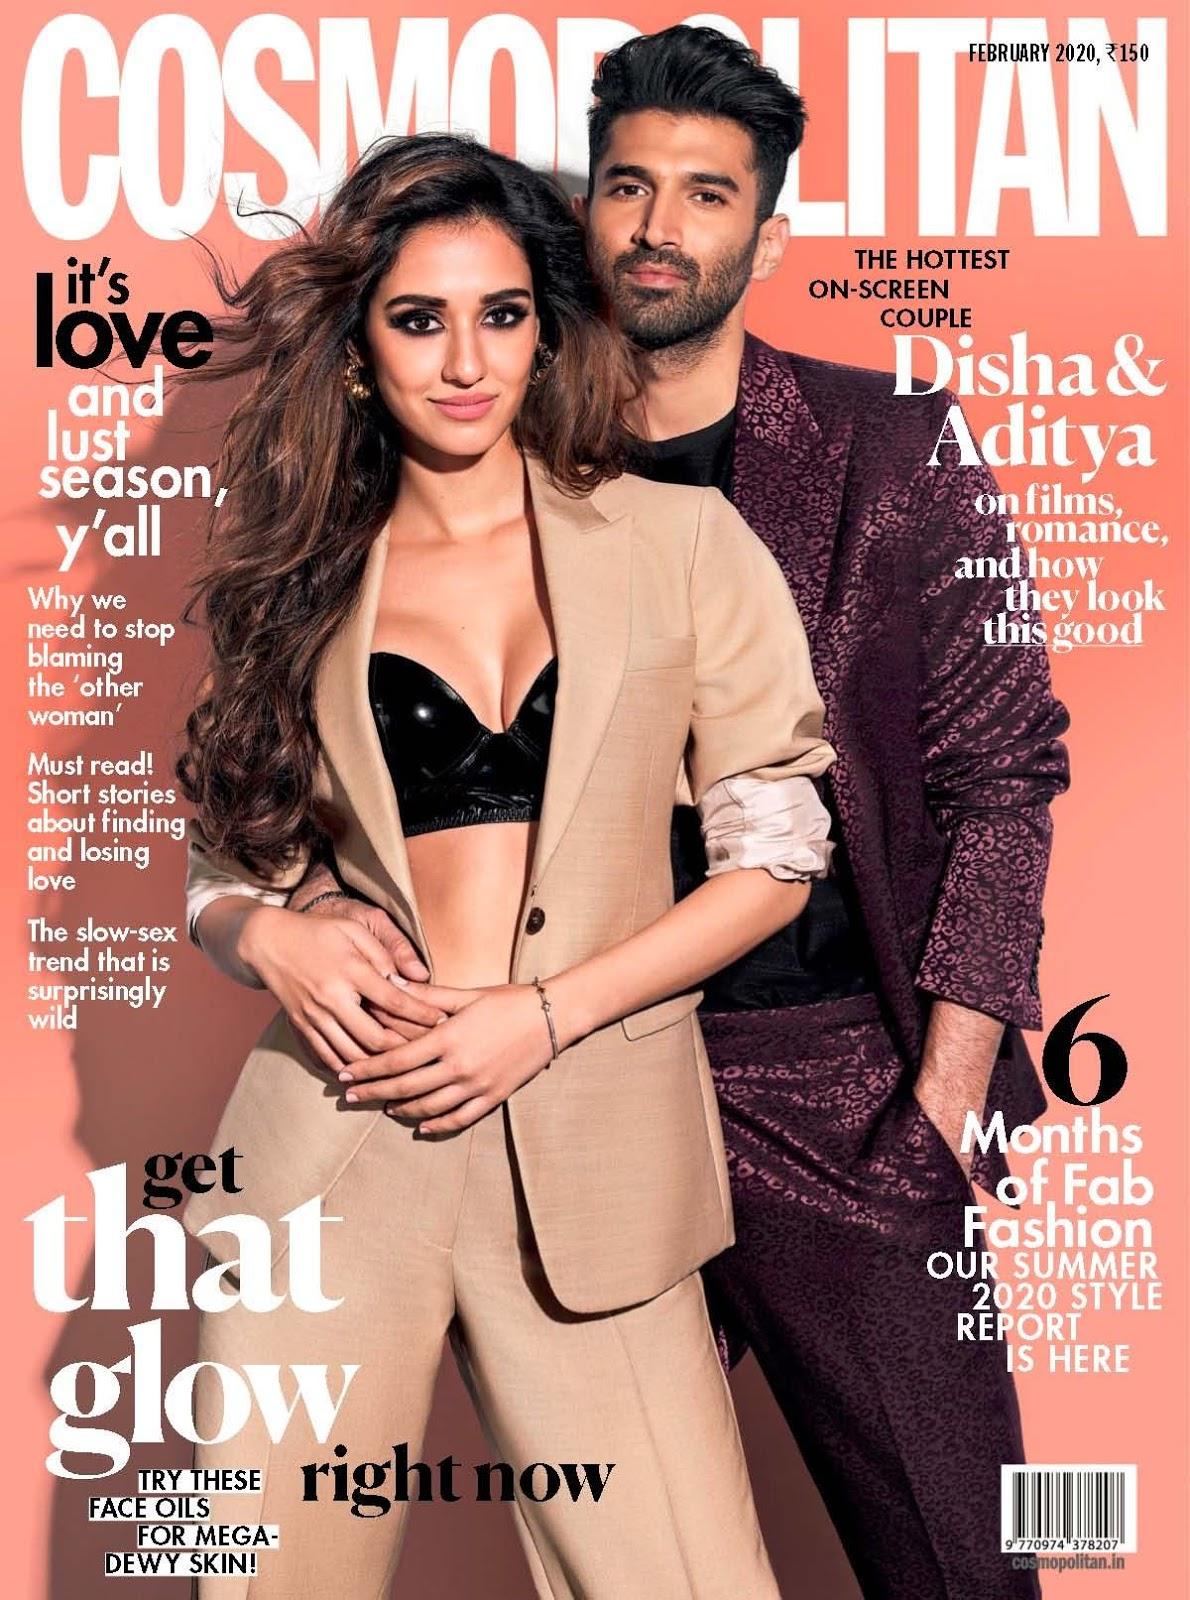 Disha Patani and Aditya Roy Kapur cover Cosmopolitan India February 2020